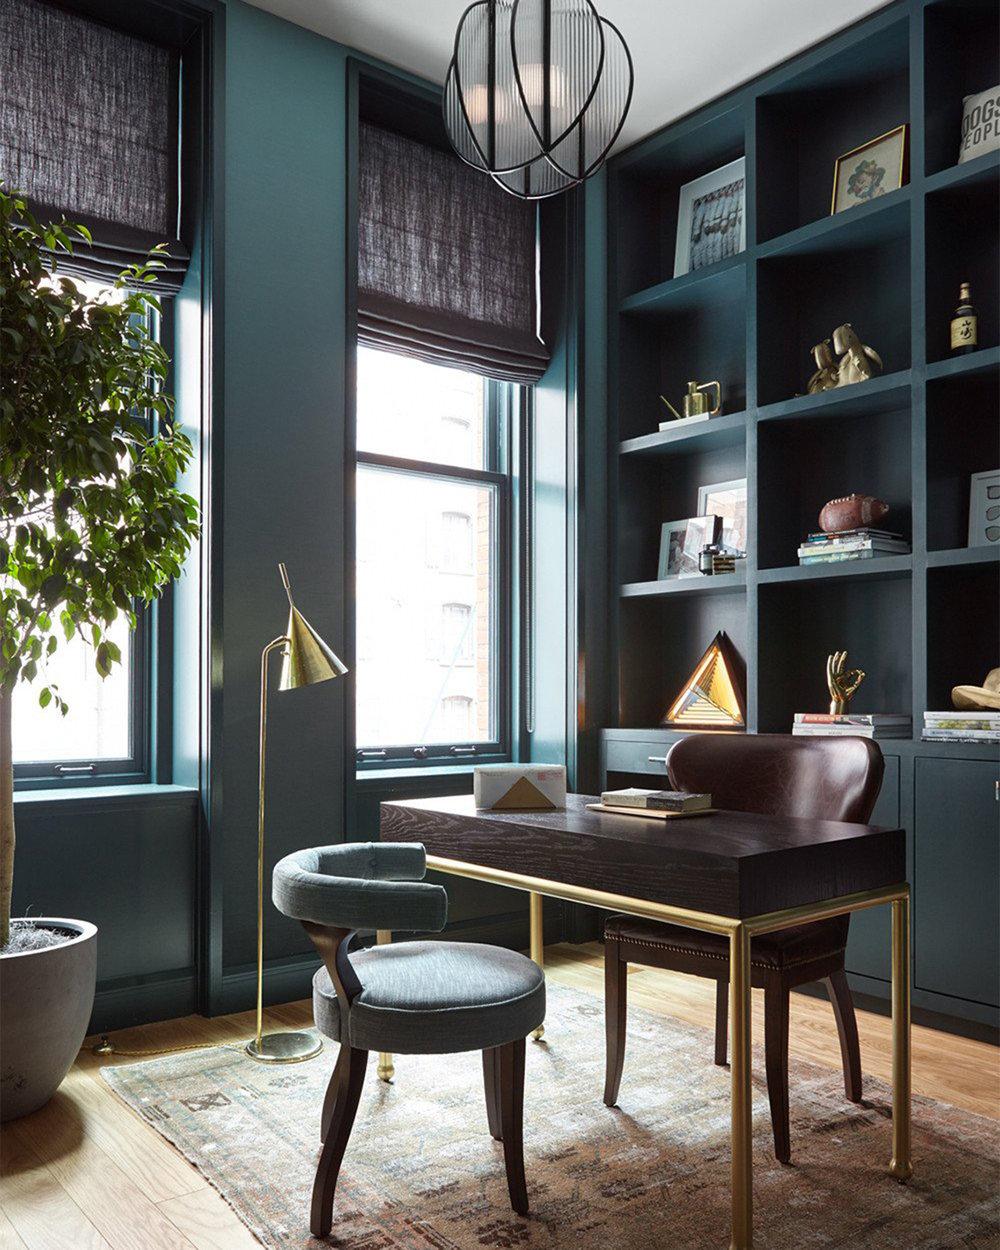 Washington Street, New York — Interior by Consort / Photograph by Reid Rolls